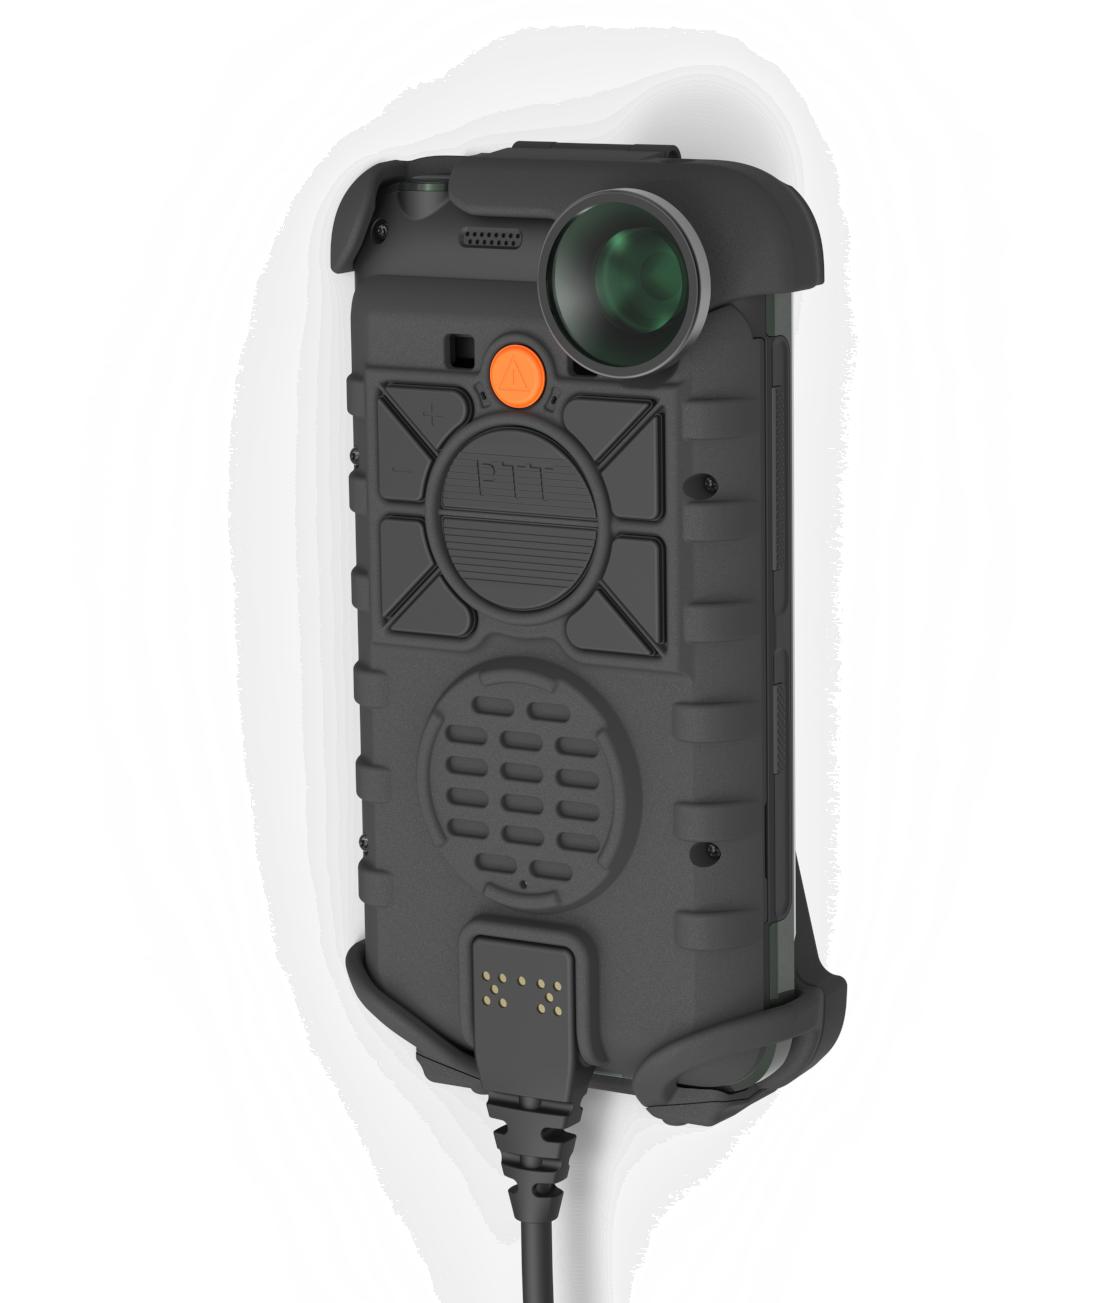 Bittium Tough Mobile HybridX Tactical extension